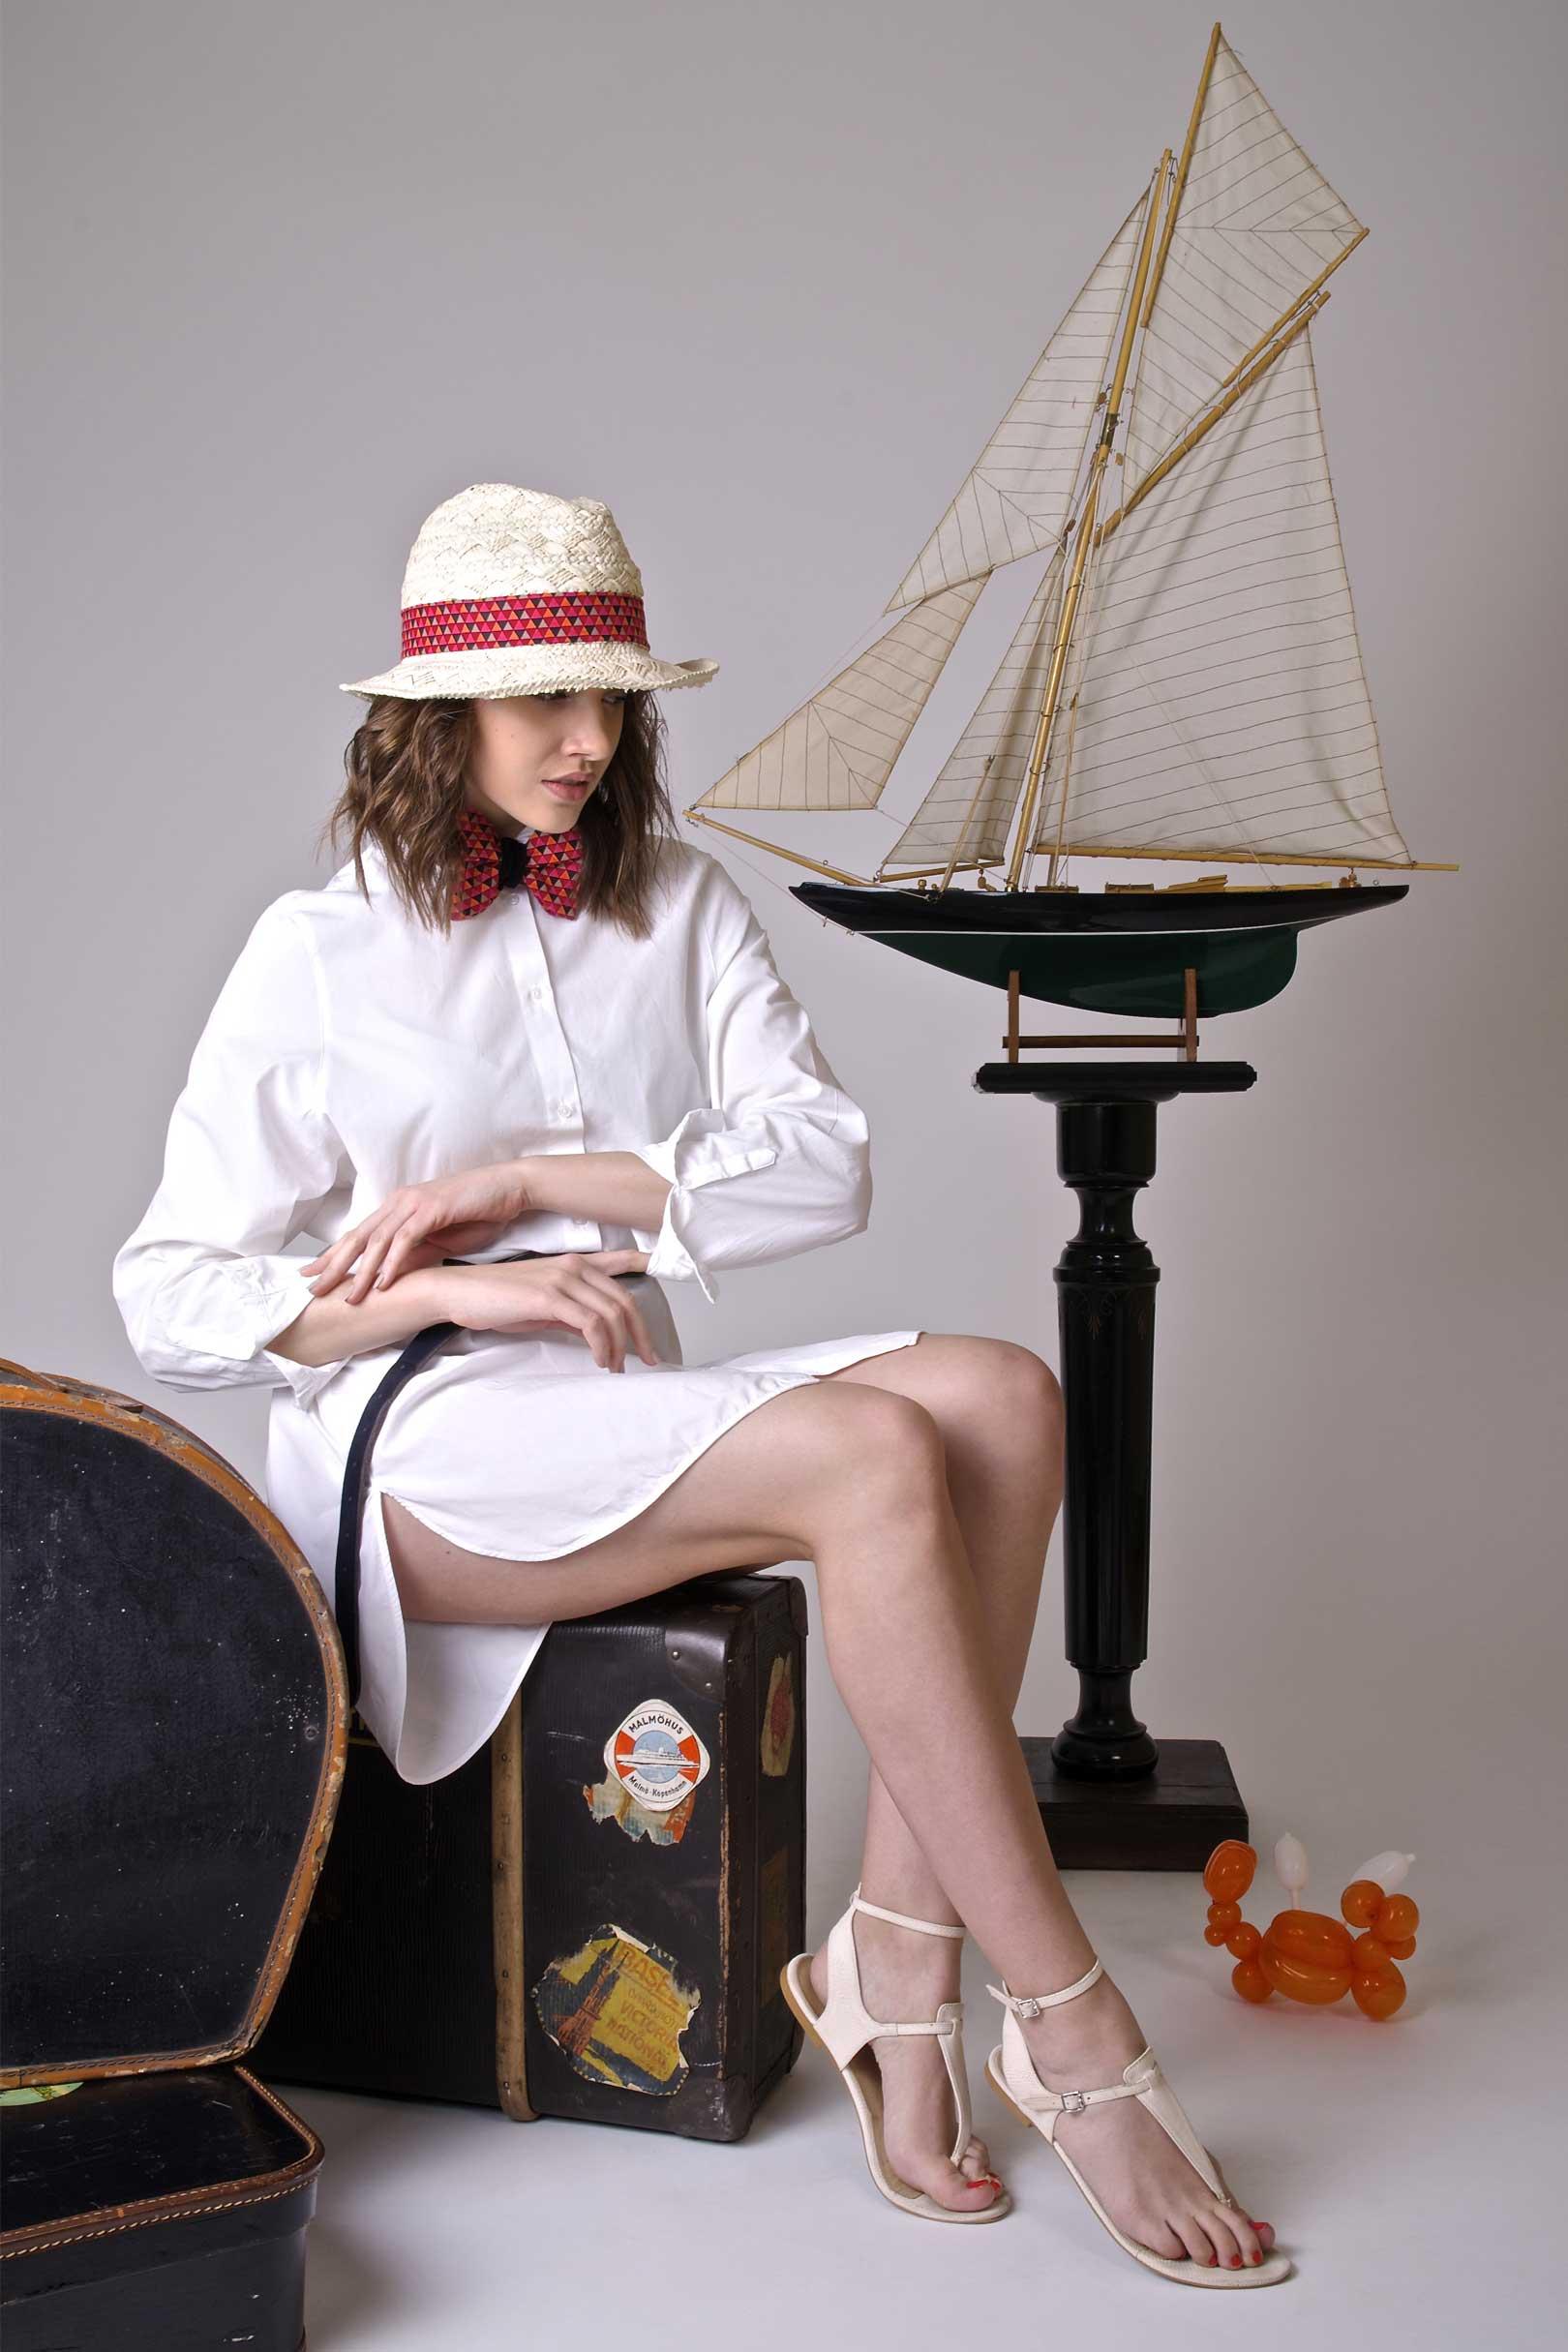 Das Querbinder-Modell 'Madmoiselle P.'.